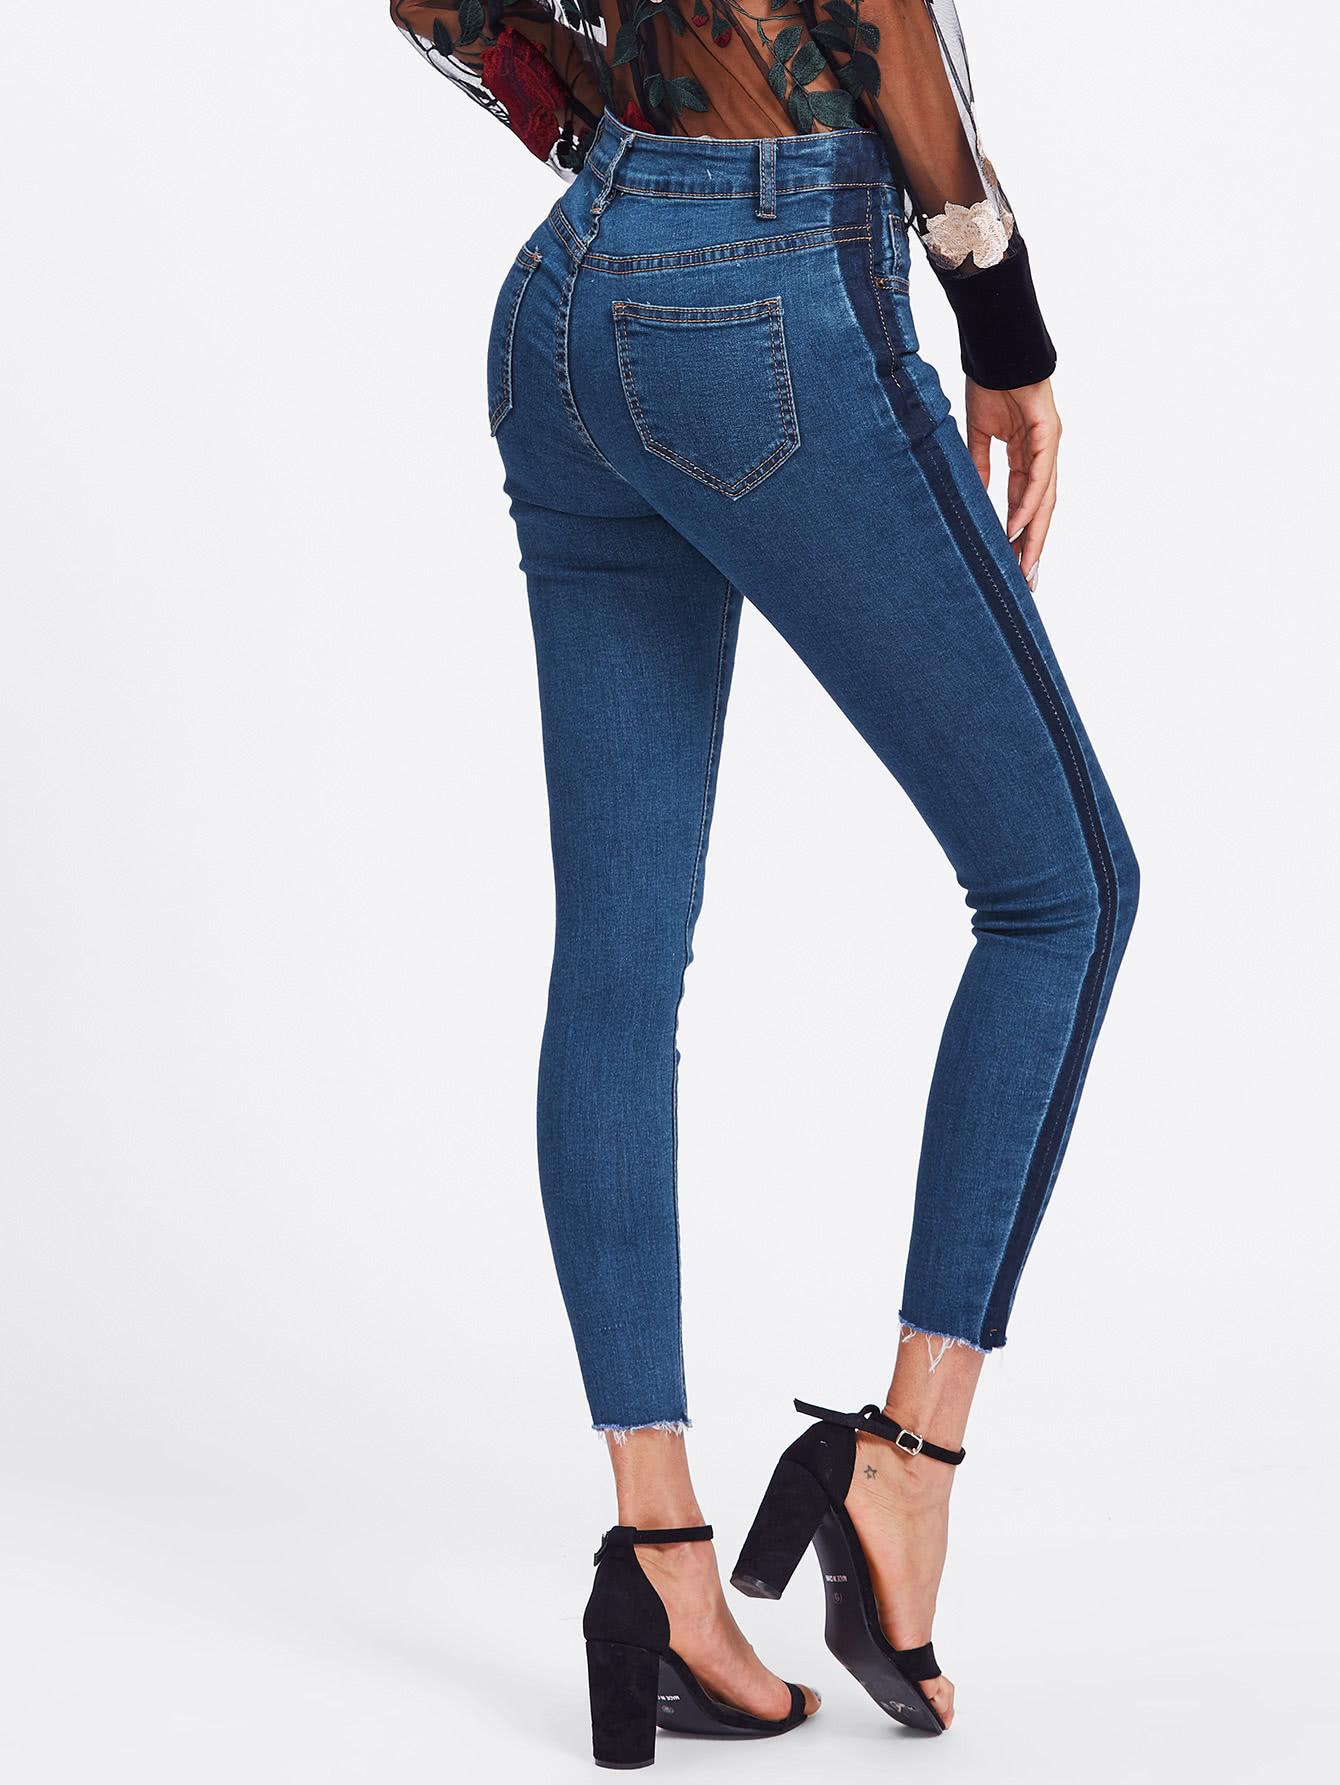 Contrast Side Striped Frayed Hem Jeans contrast pleated sleeve frayed hem tweed dress